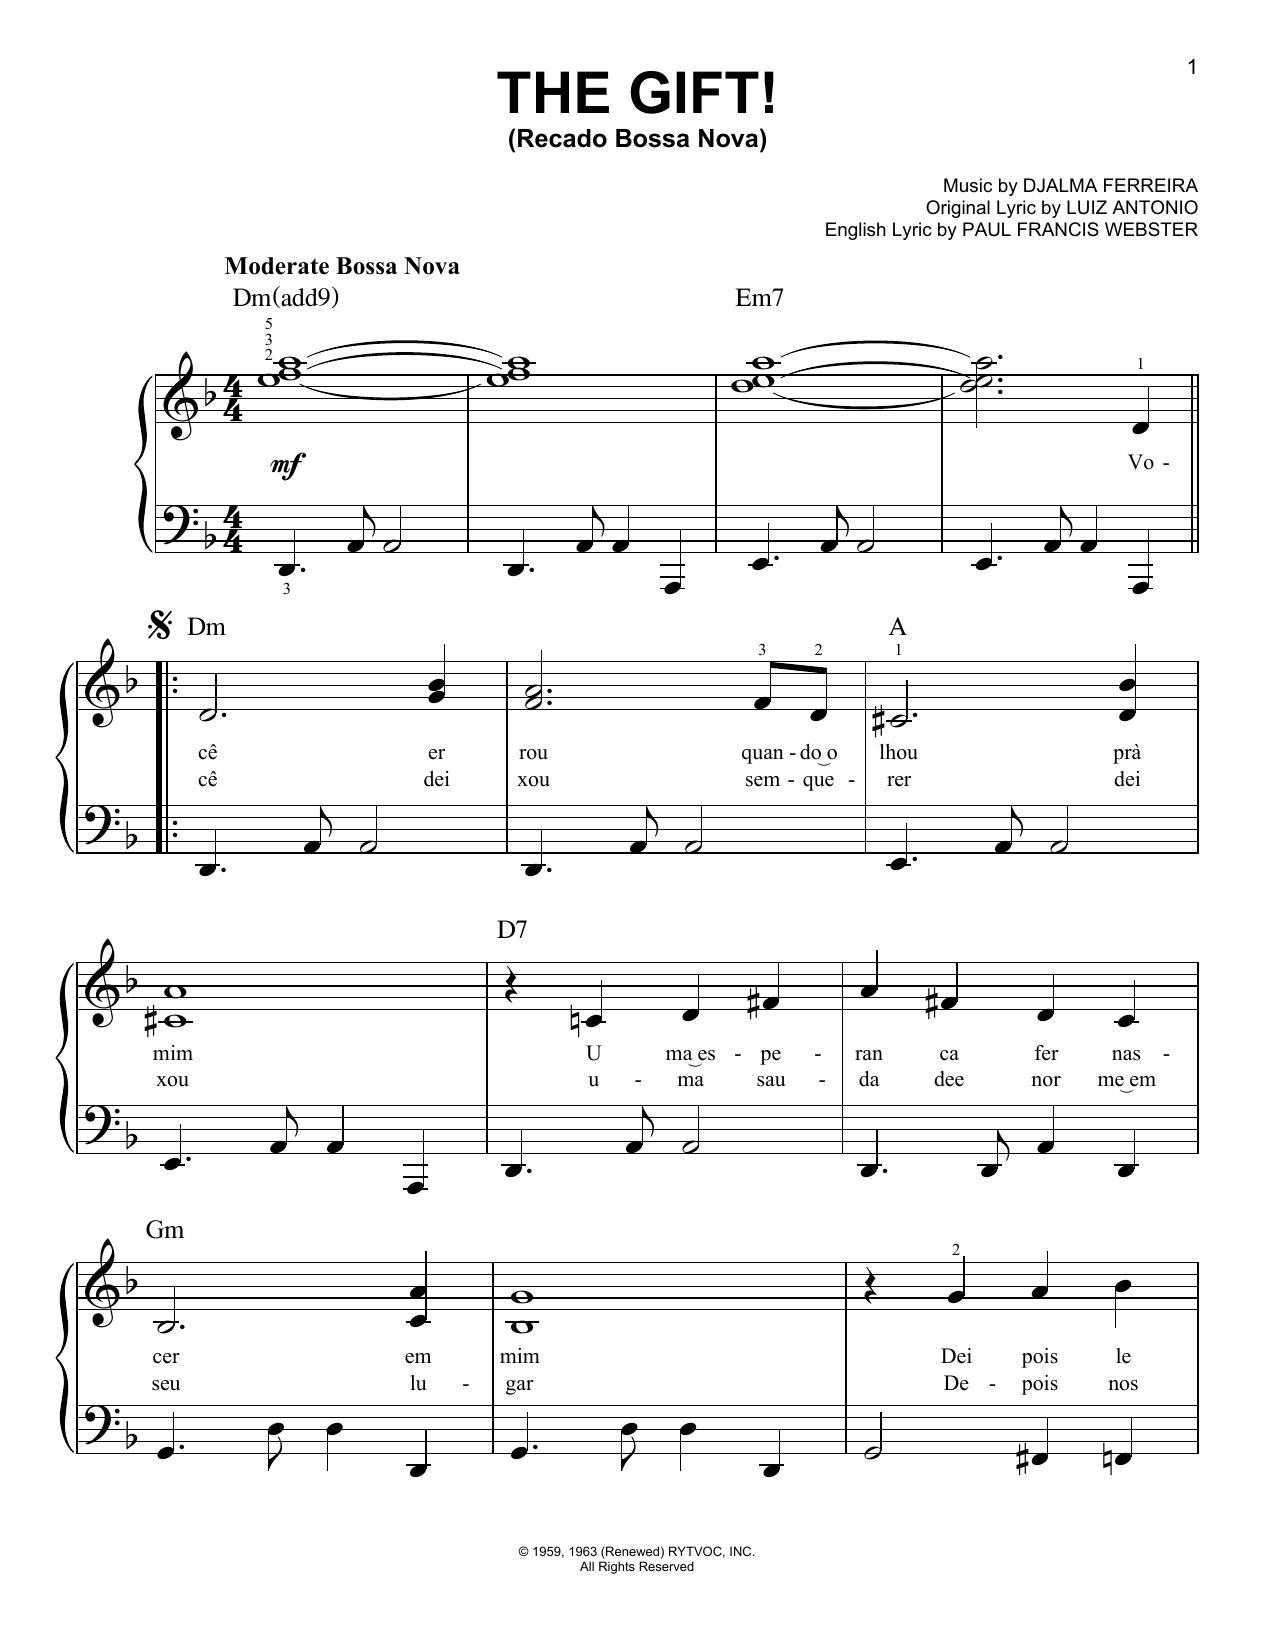 The Gift! (Recado Bossa Nova) (Very Easy Piano)